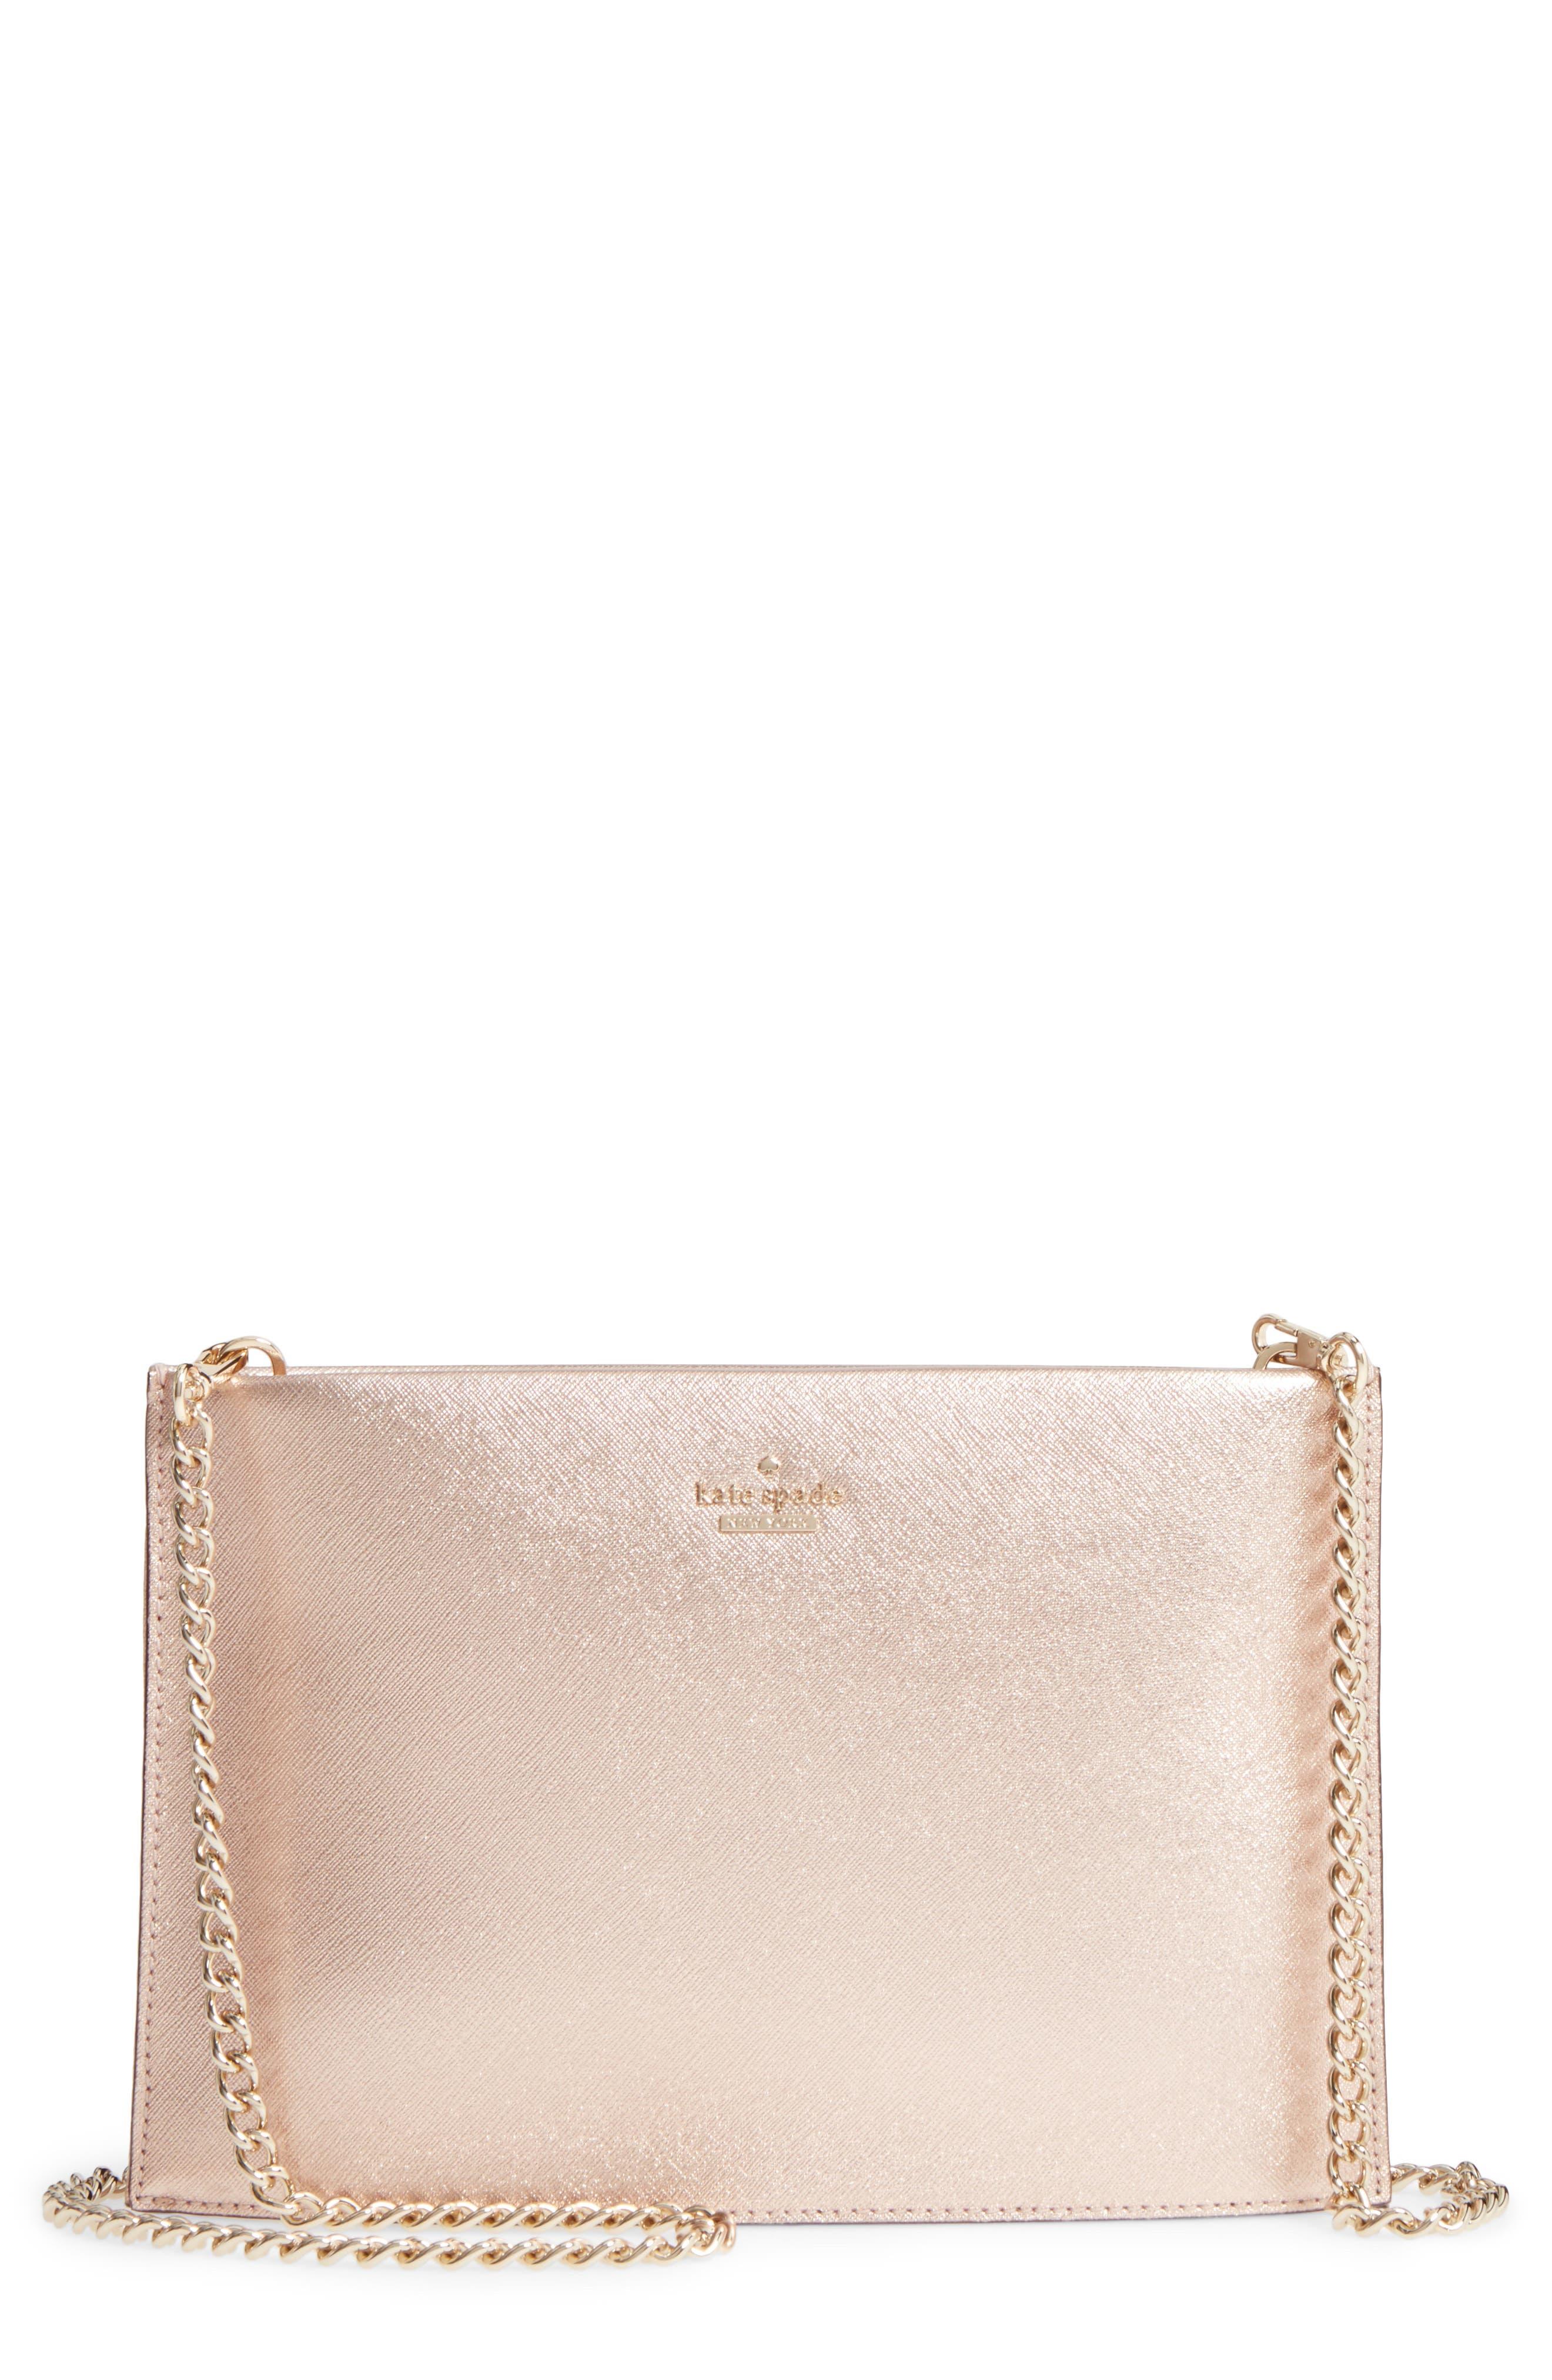 cameron street - sima leather crossbody bag,                         Main,                         color, 650